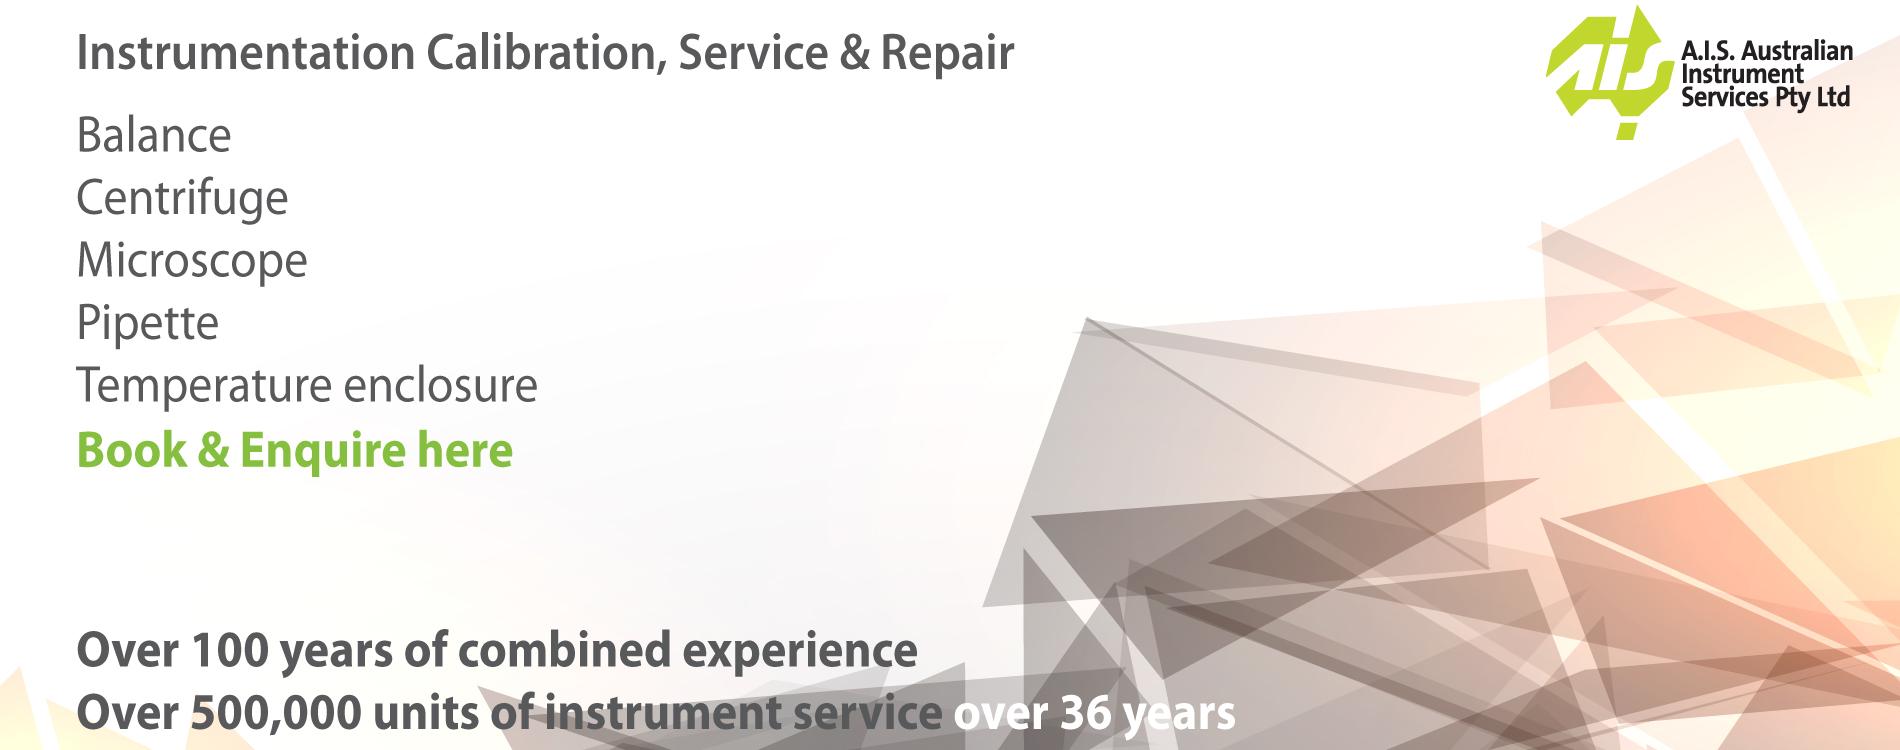 Instrumentation services